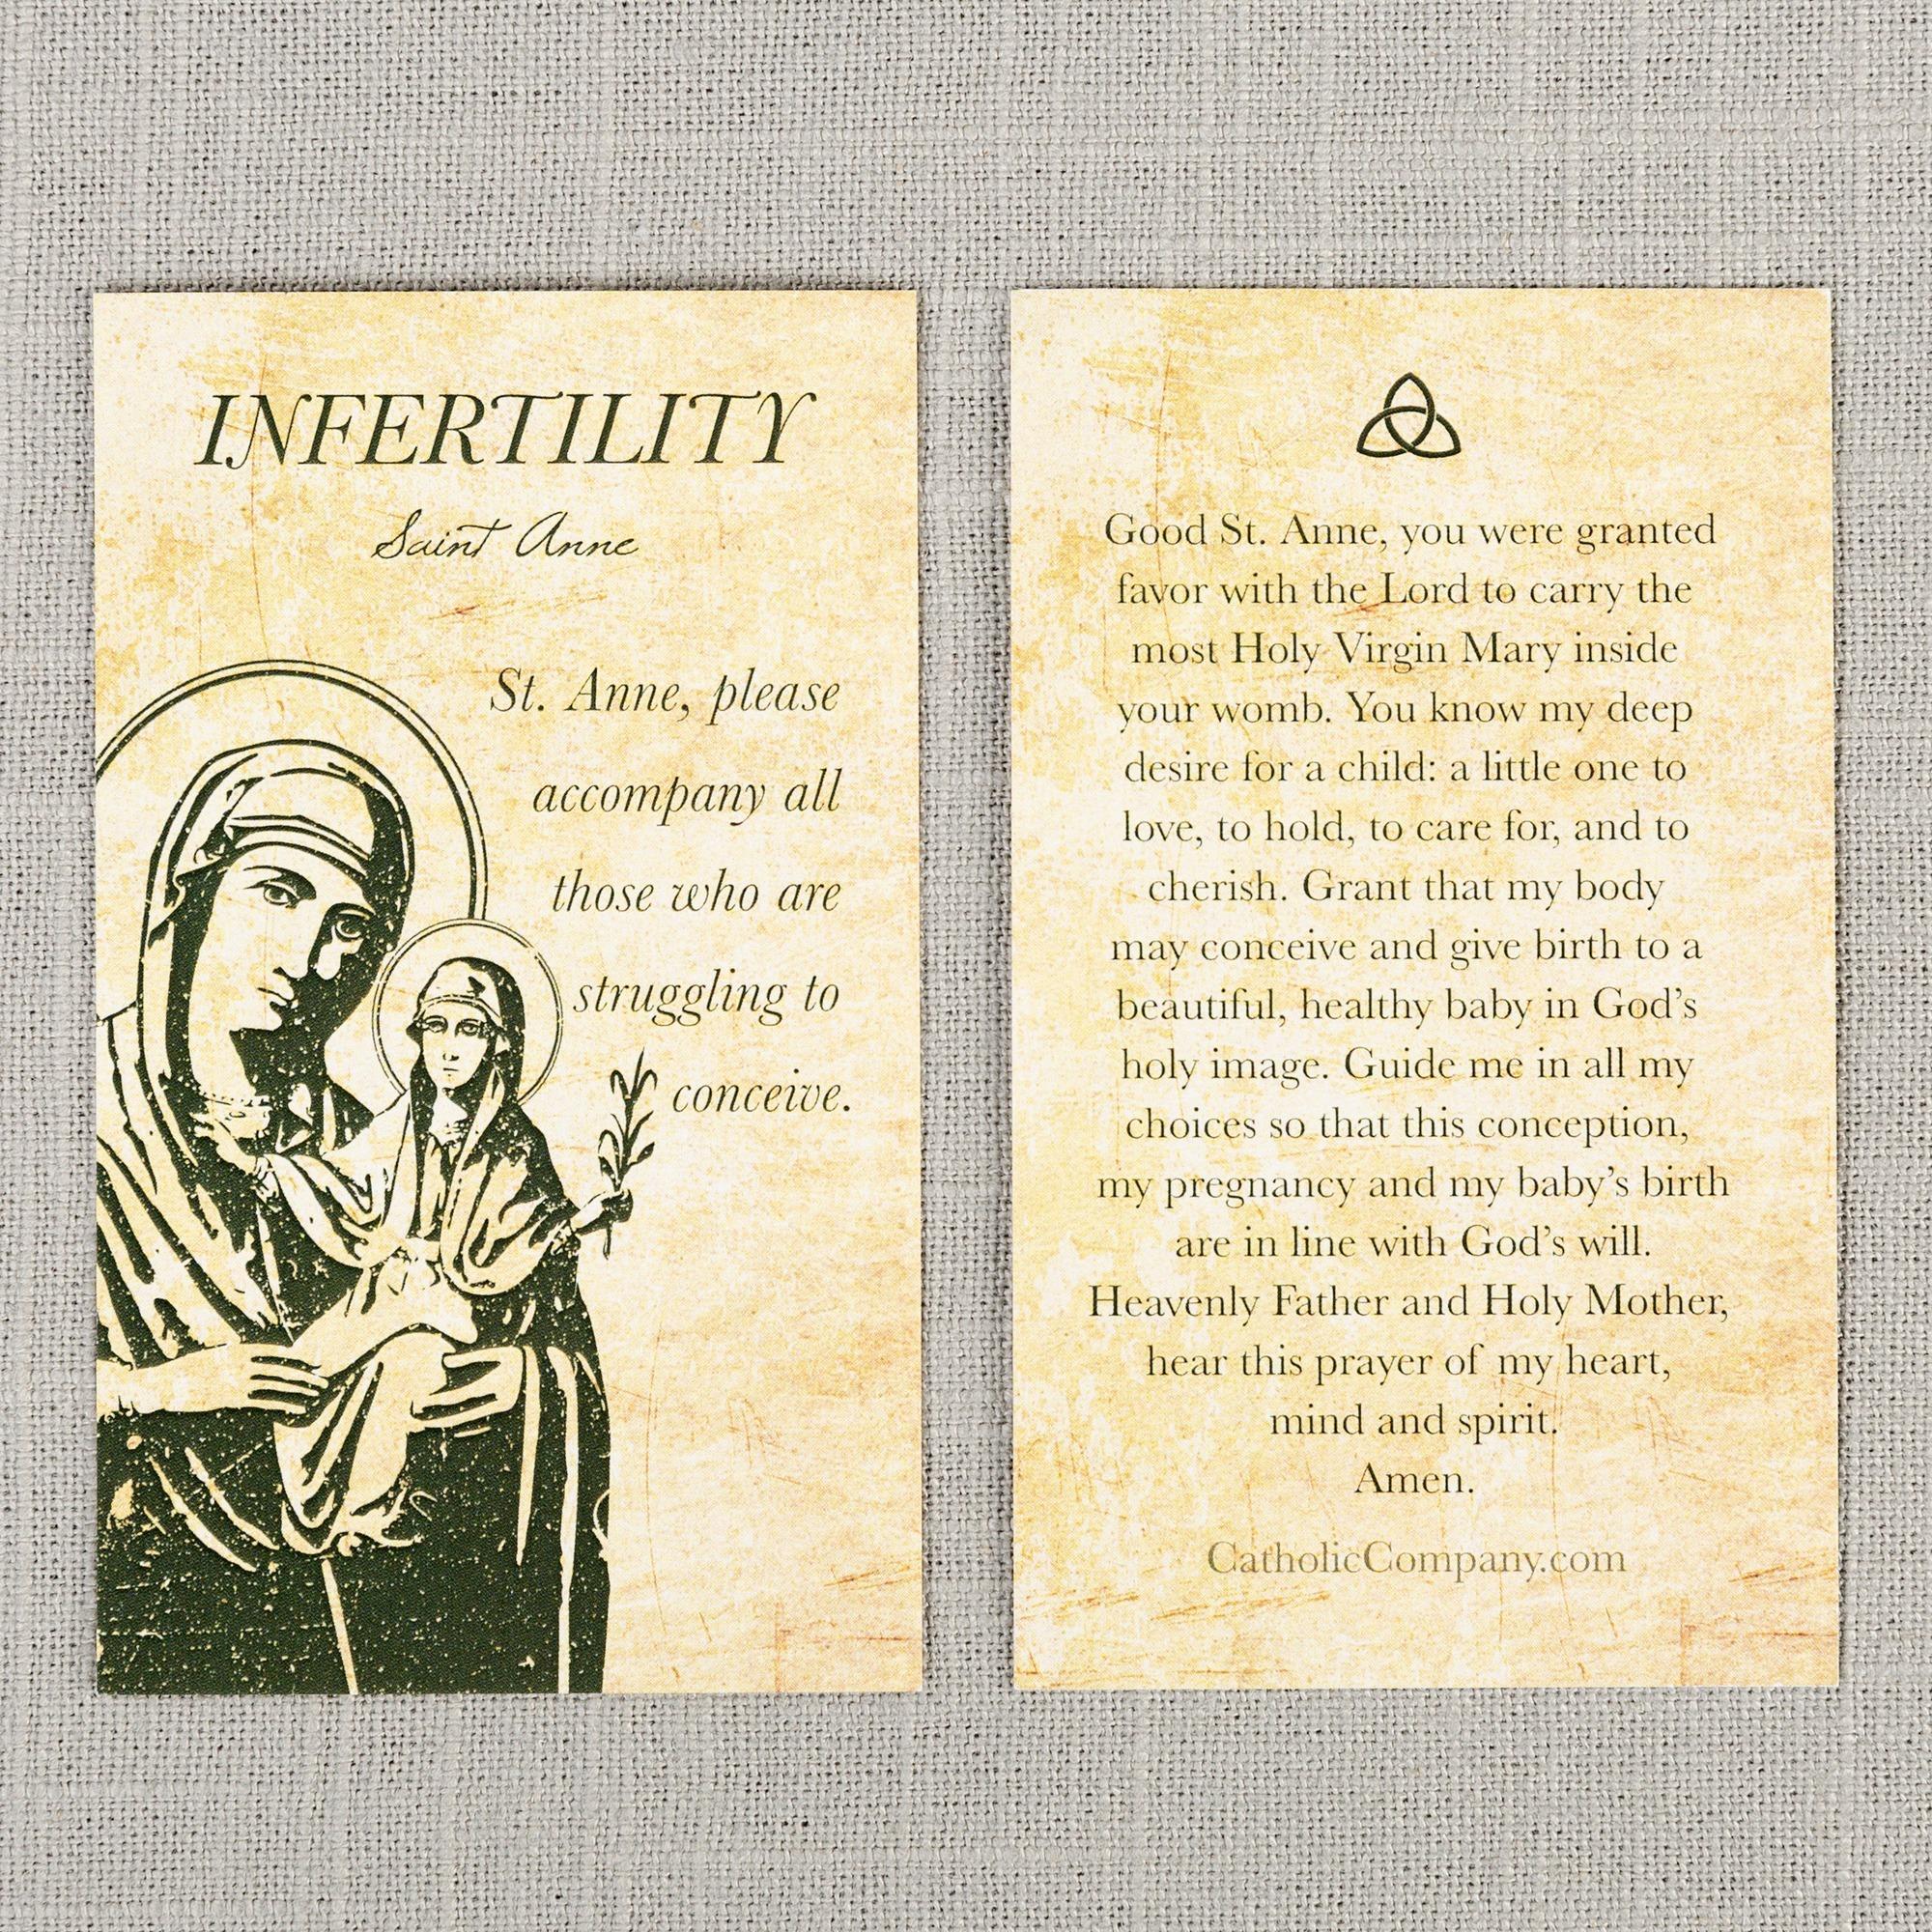 photo regarding Surrender Novena Printable identified as St. Anne - Infertility Prayer Card